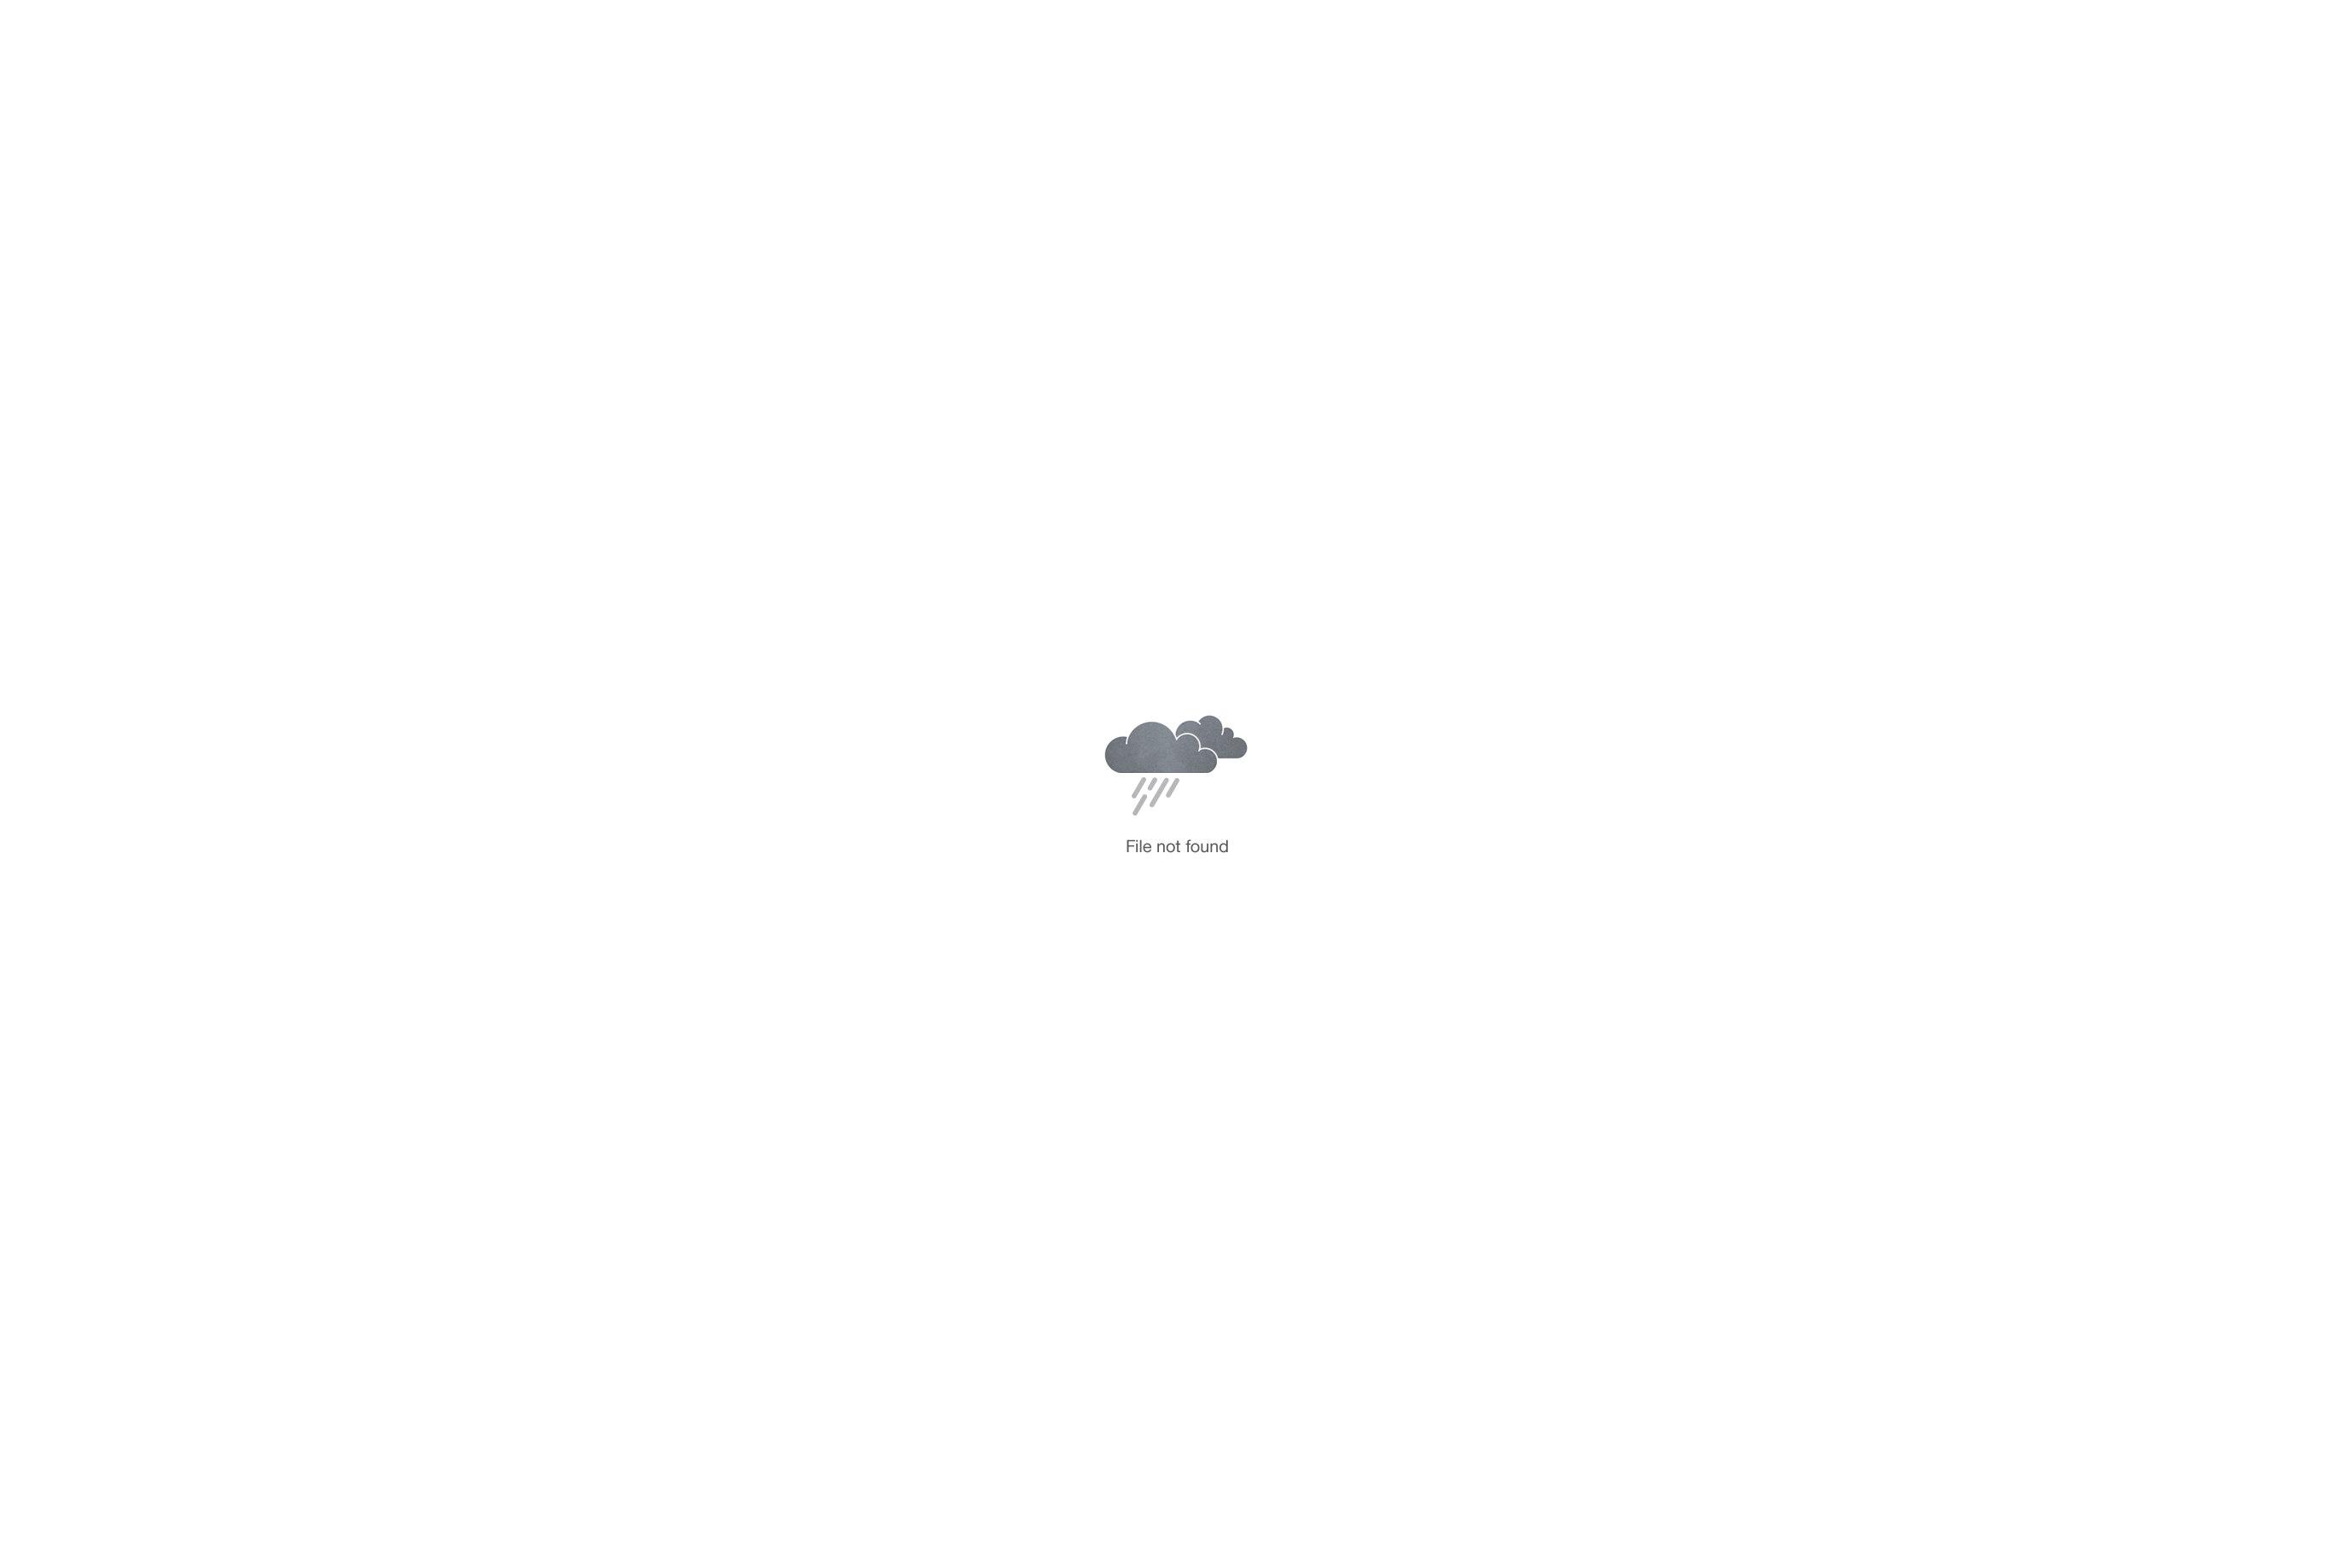 Gerald-DESCAMPS-Rugby-Sponsorise-me-image-2